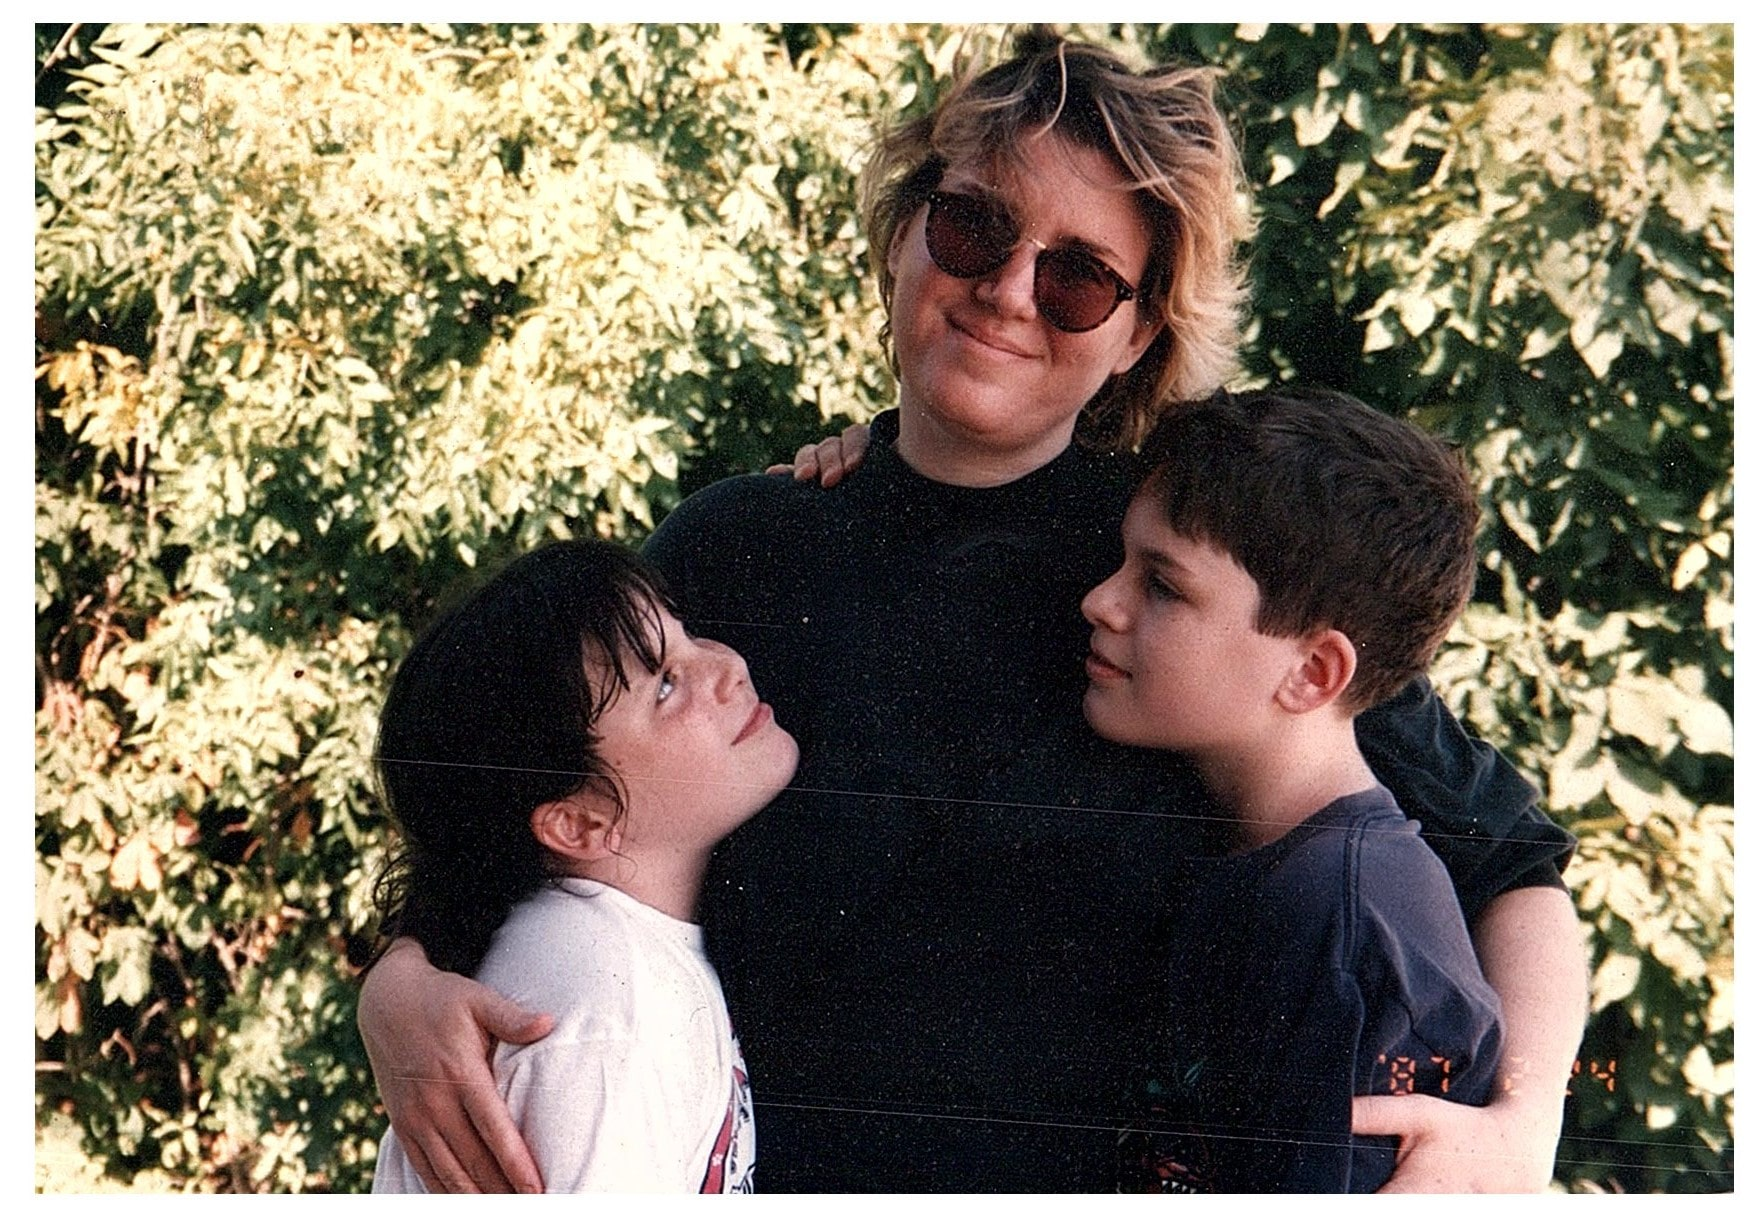 1997 c, Alex, Sherry, Oliver Borzo-.jpg